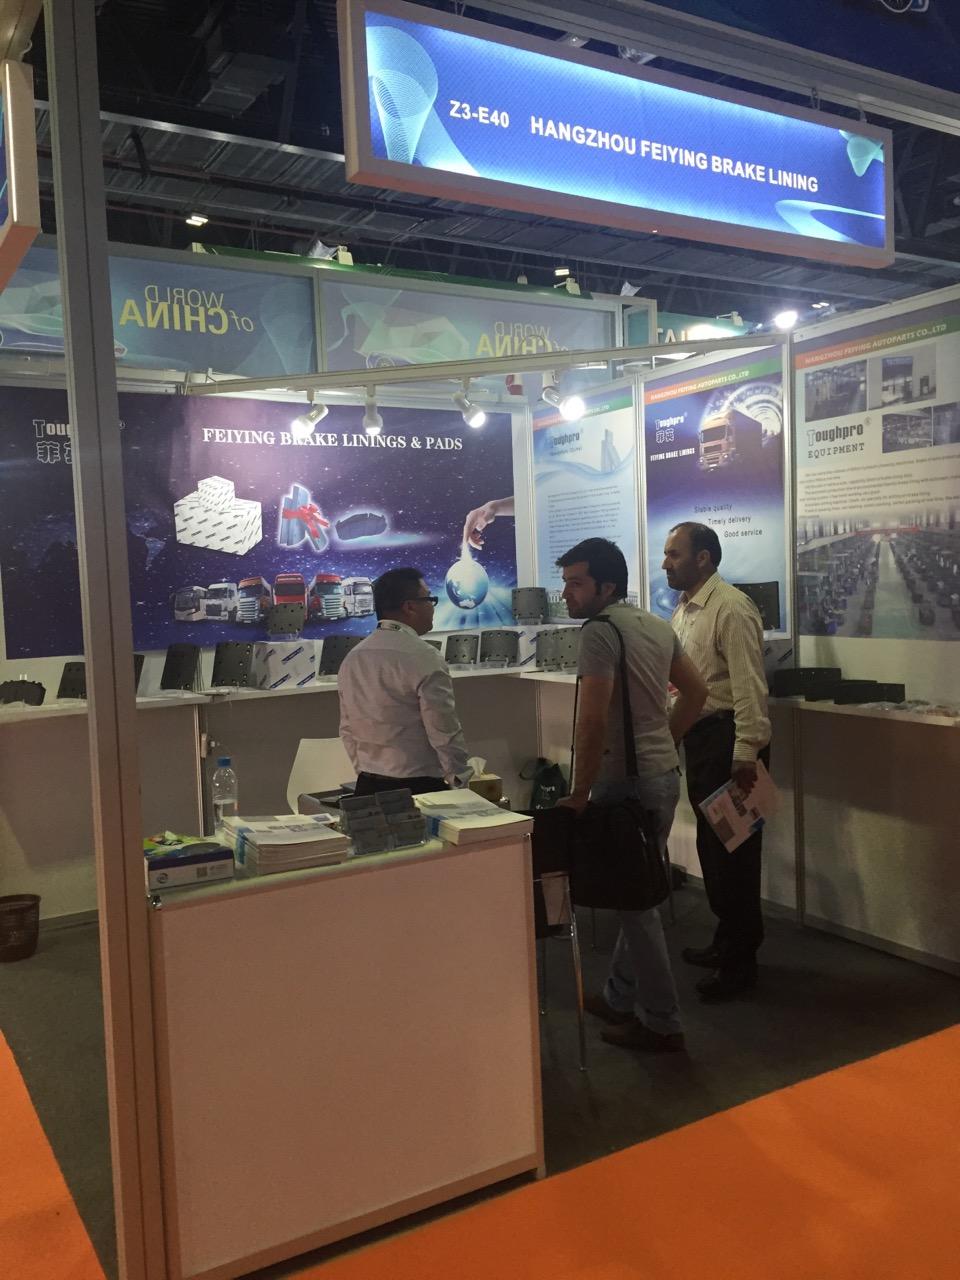 Automechanika exhibition in dubai